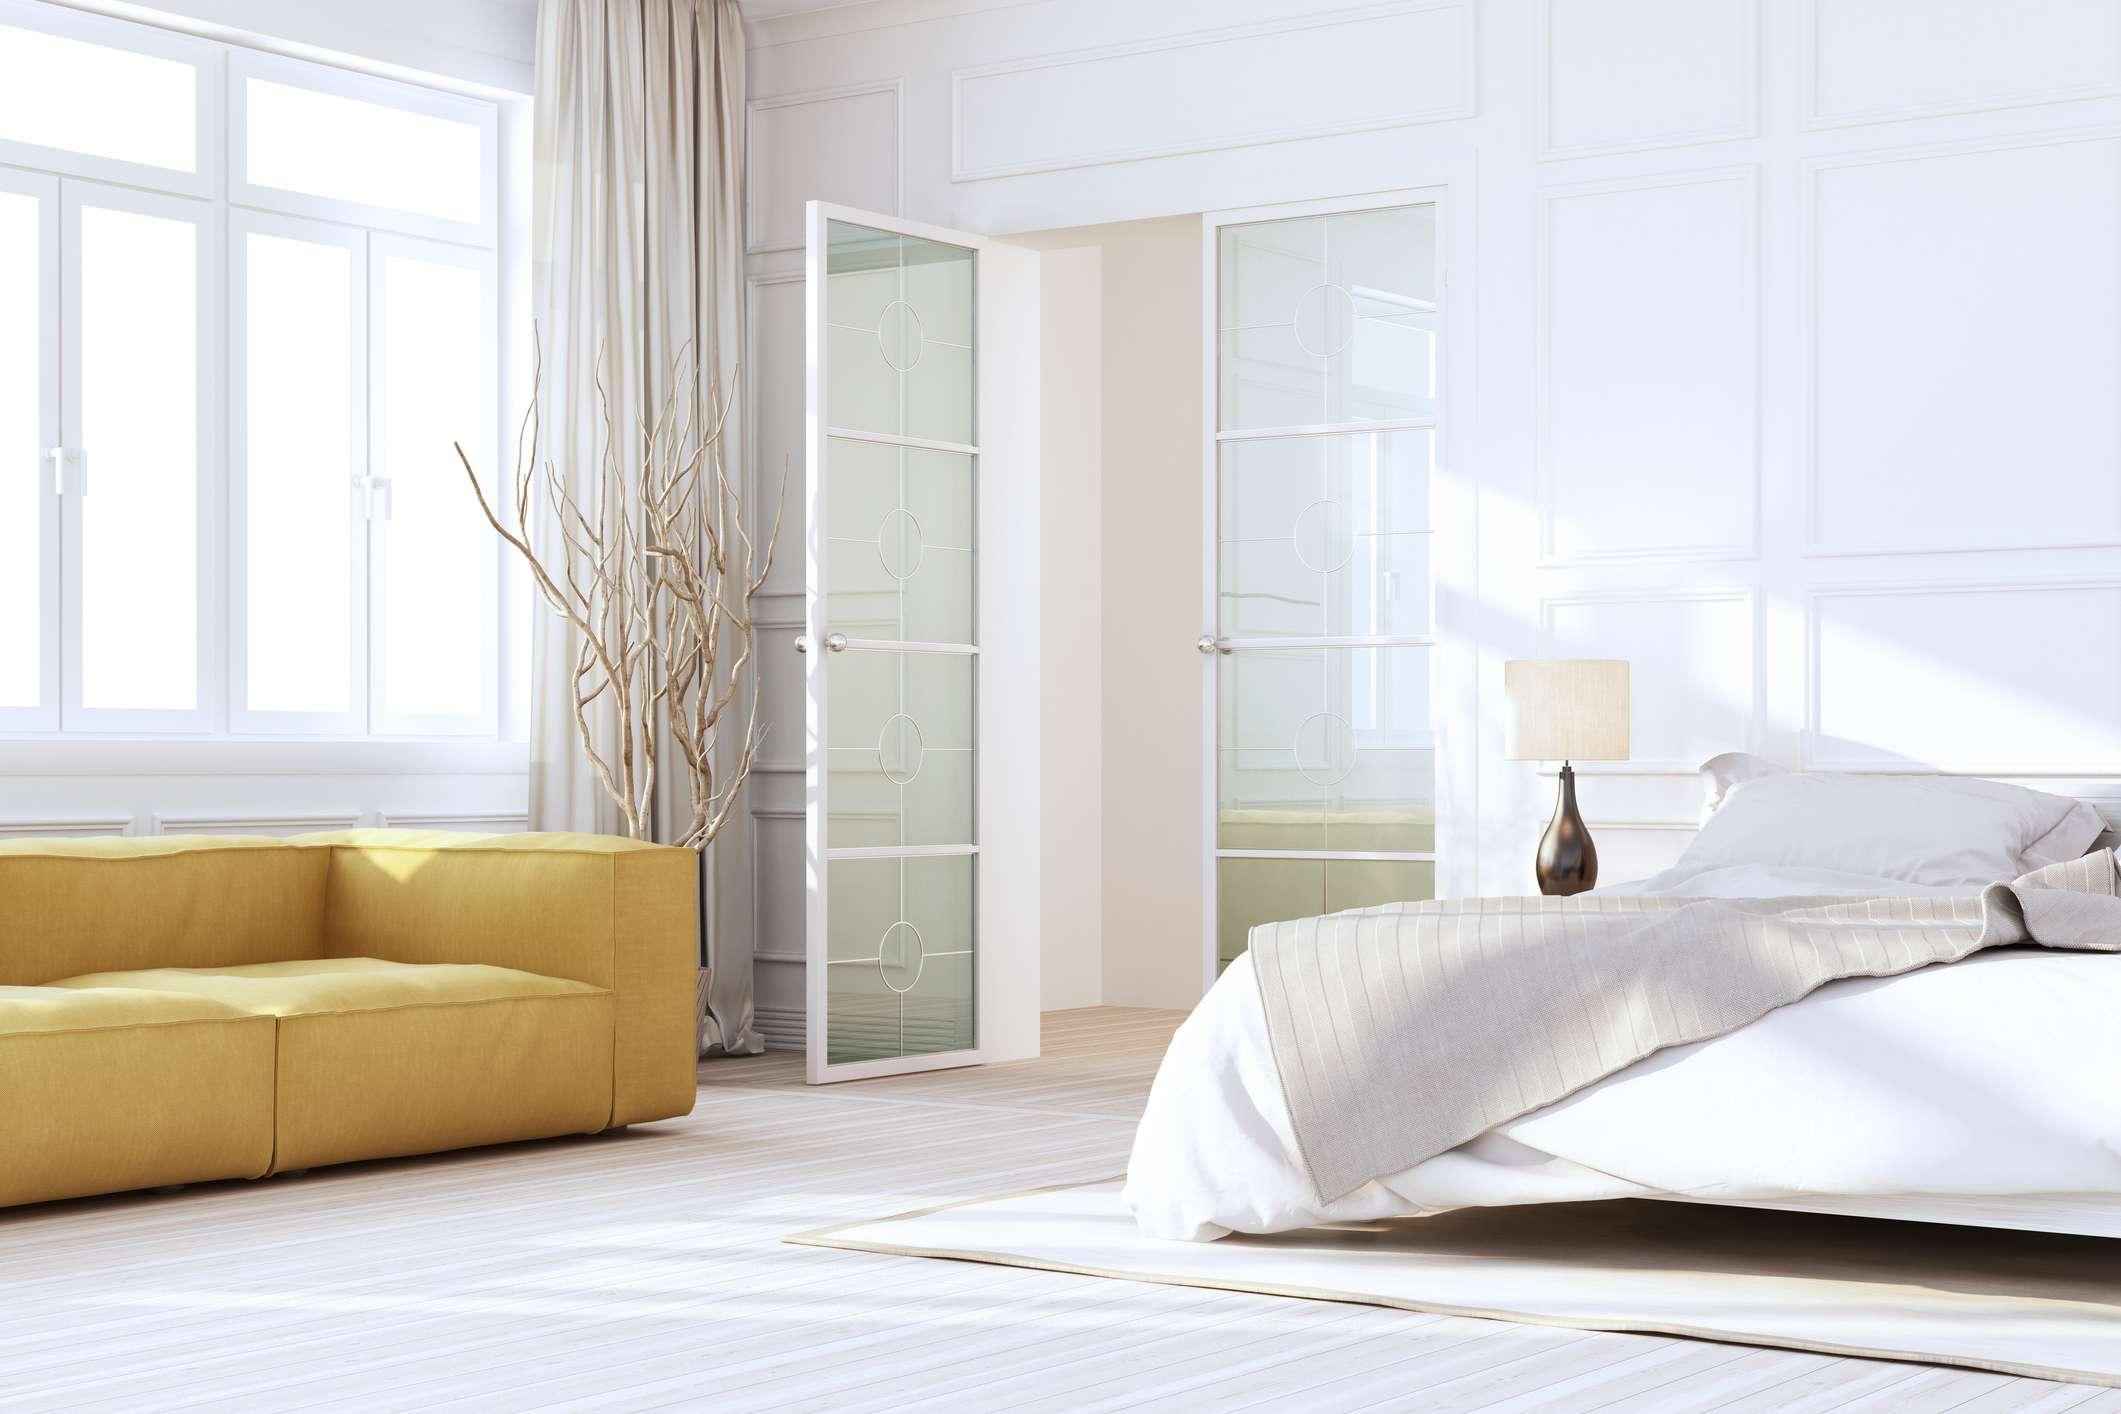 White Luxury Bedroom Interior with yellow sofa and glass doors